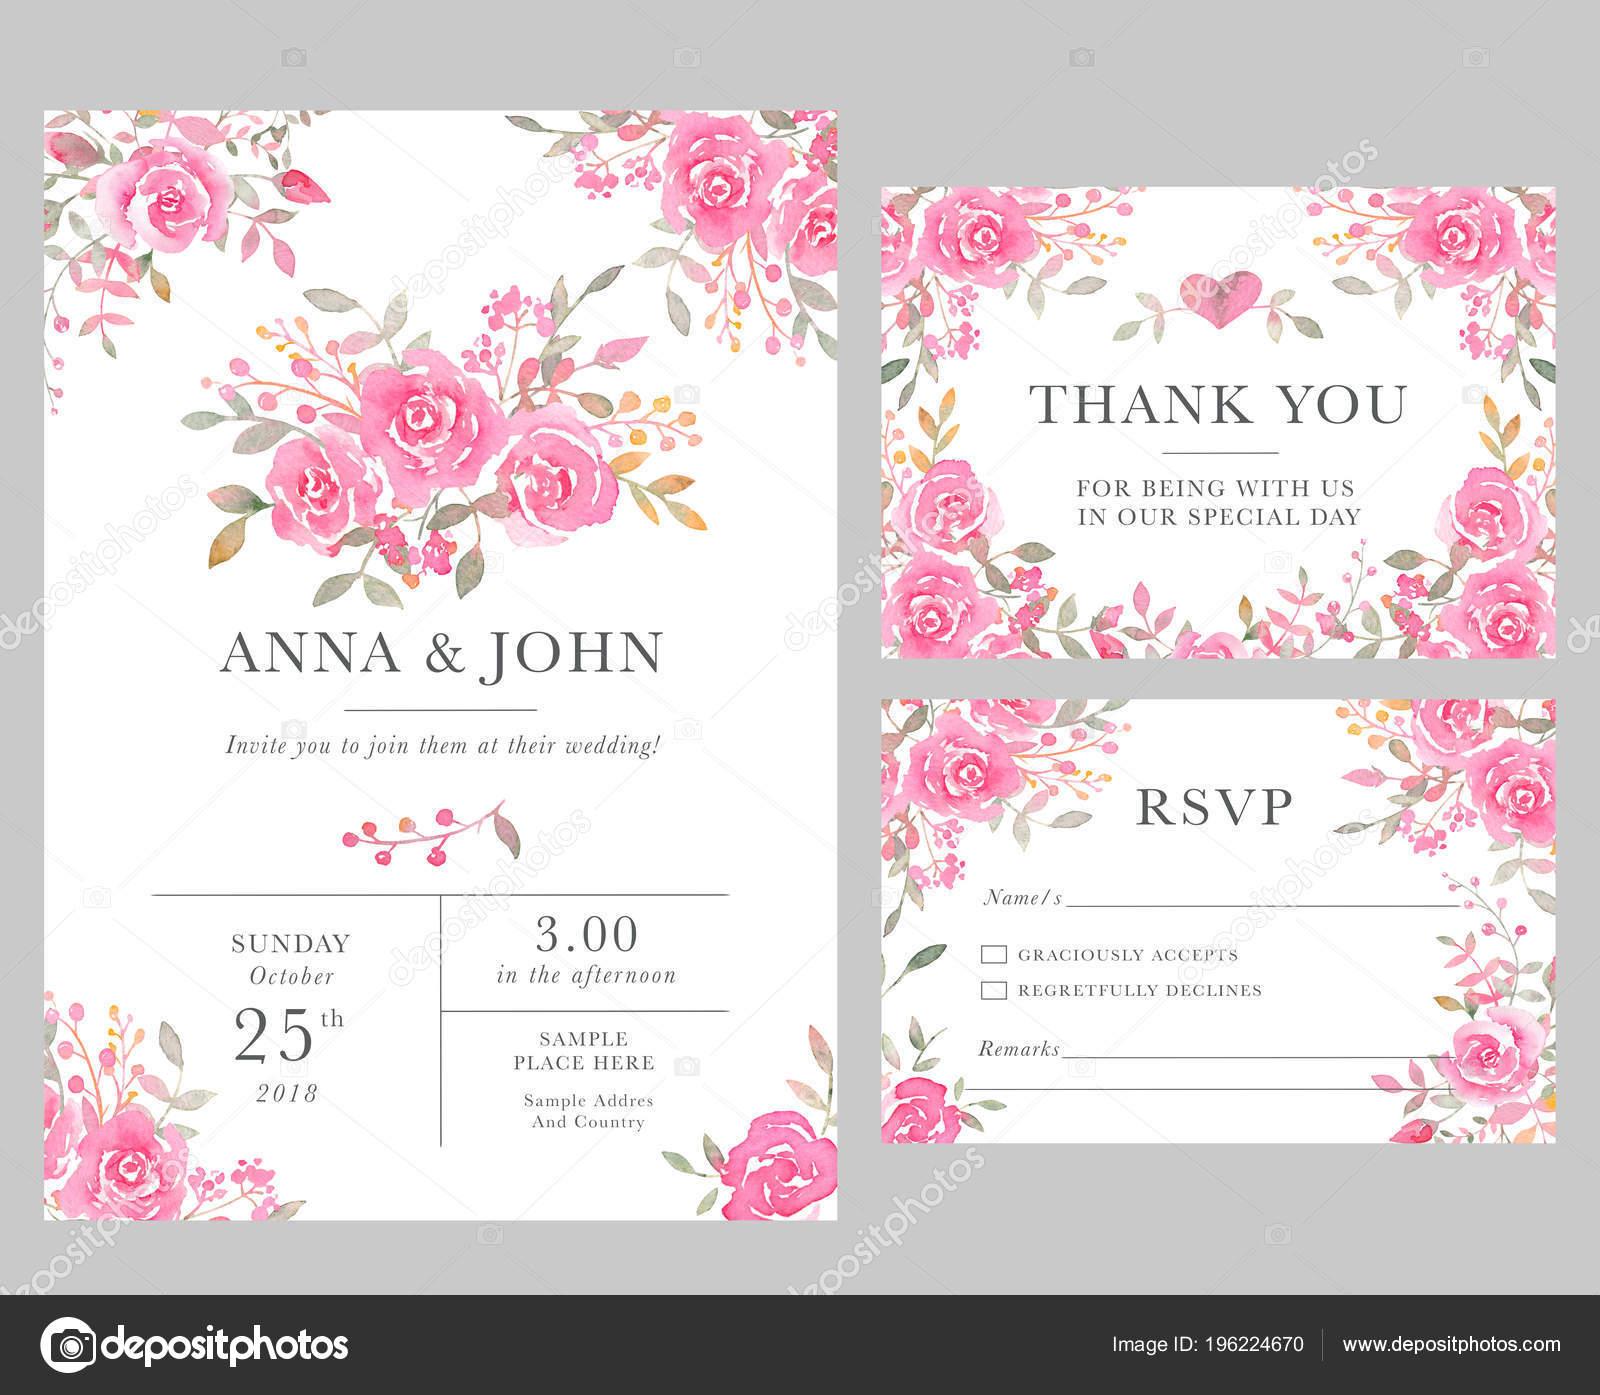 wedding wish card template